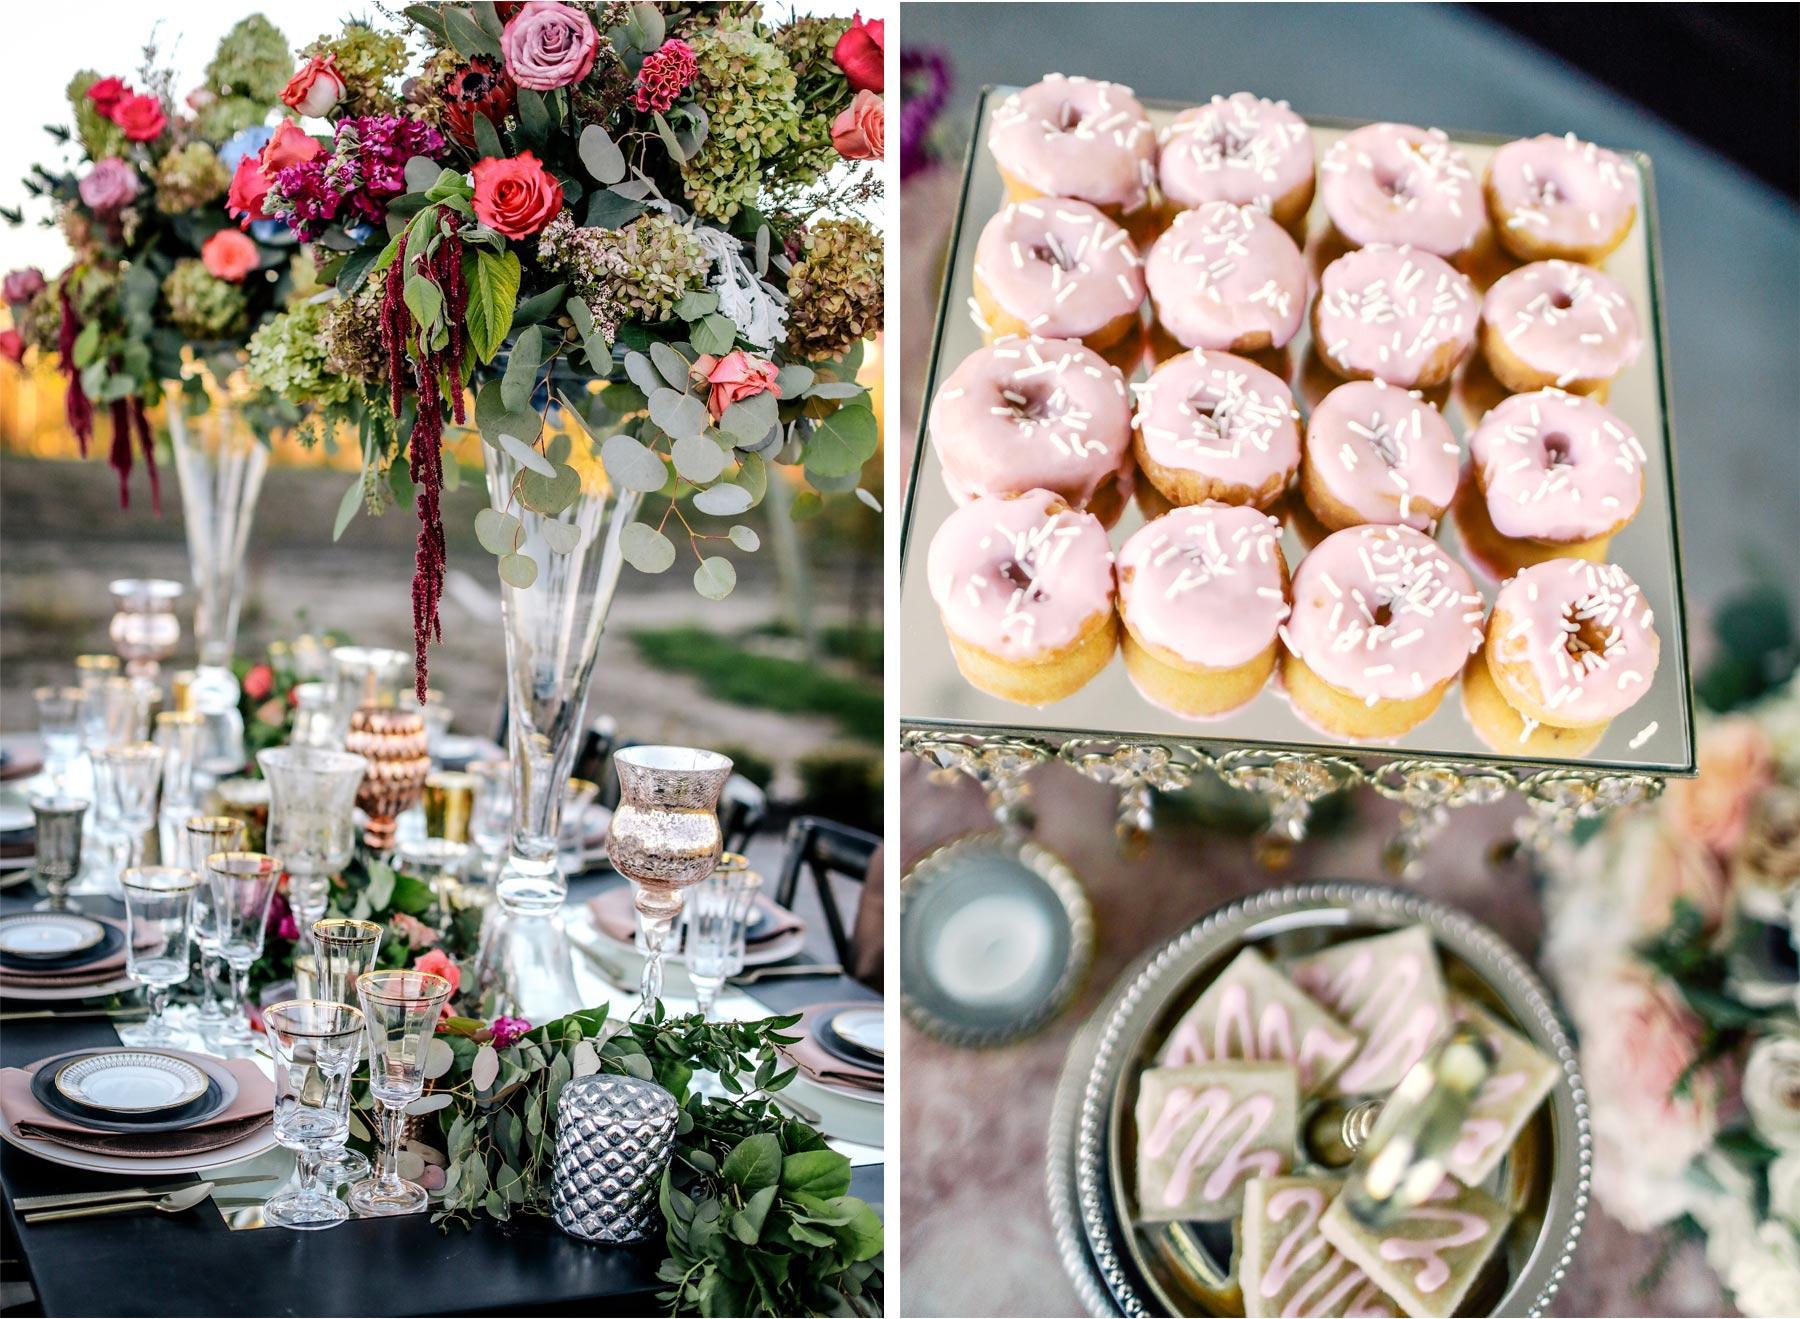 10-Ashery-Lane-Farm-Minneapolis-Minnesota-Wedding-Styled-Shoot-New-Venue-Barn-Orchard-Vineyard-Dinner-Place-Setting-Plates-Decor-Donuts.jpg